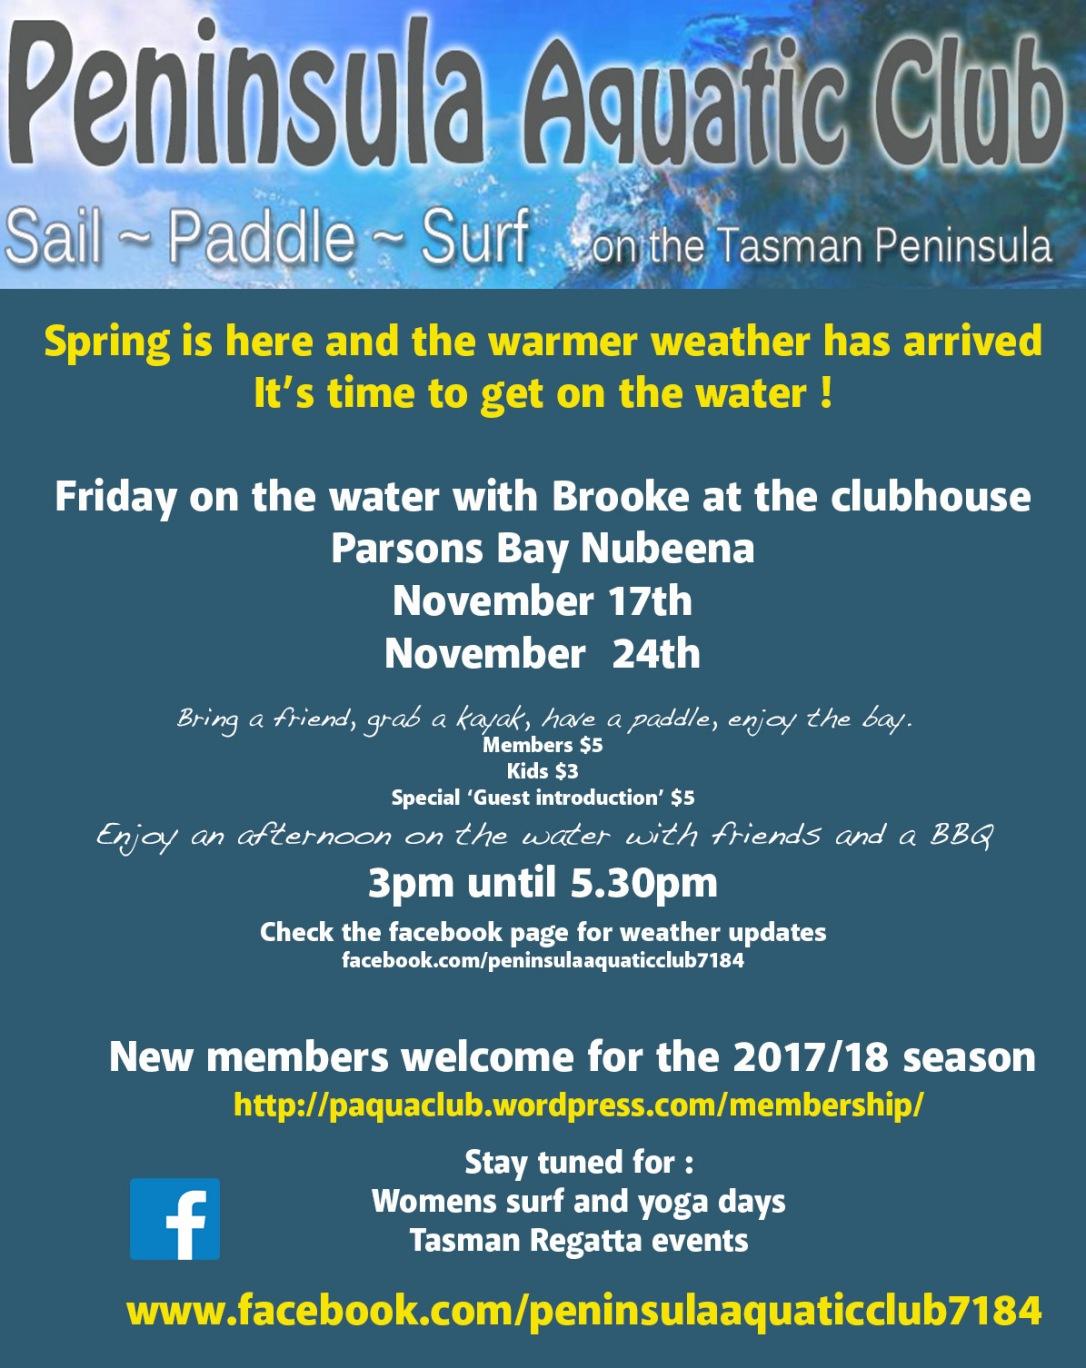 peninsula aquatic club spring sessions